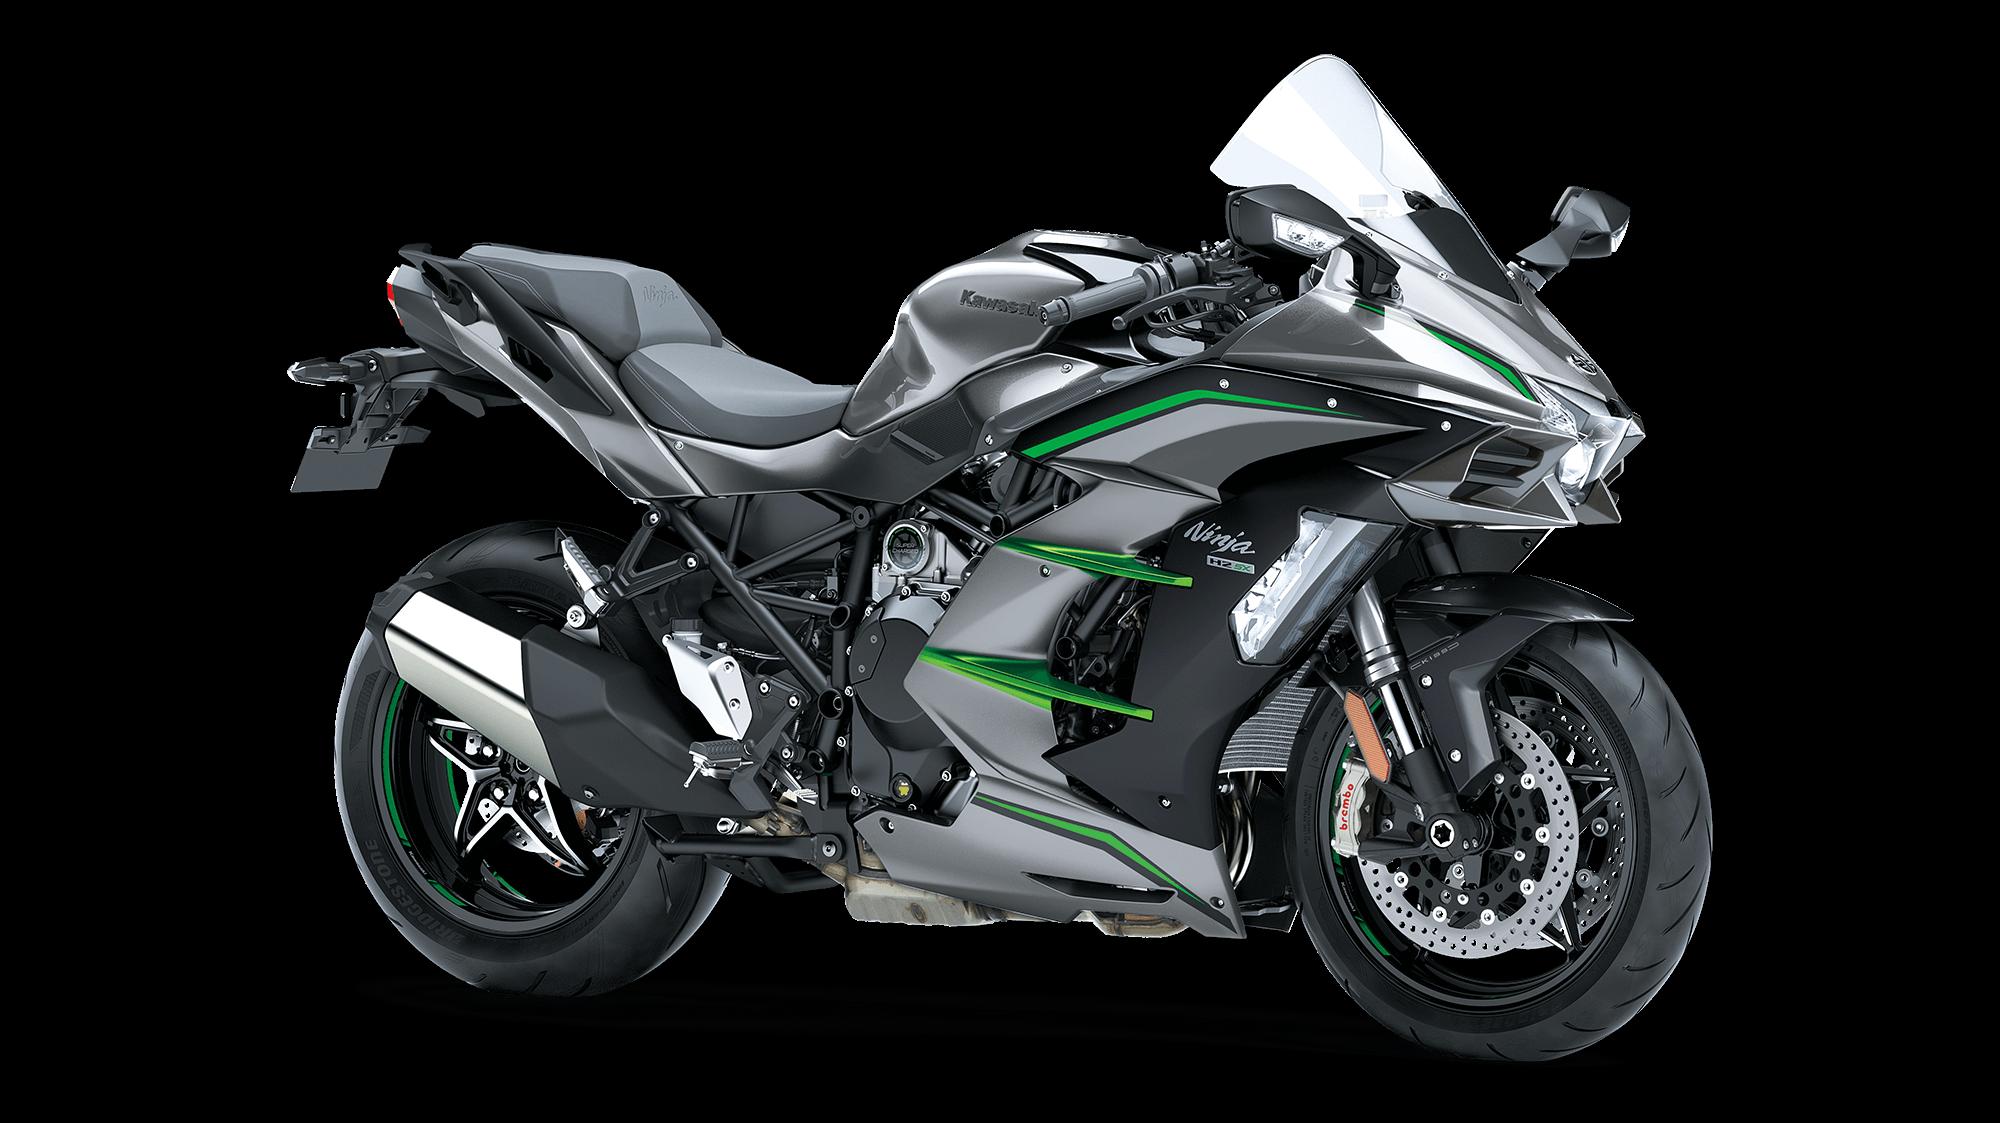 hight resolution of kawasaki motorcycles atv sxs jet ski personal watercraft kawasaki ninja kawasaki com diagrams